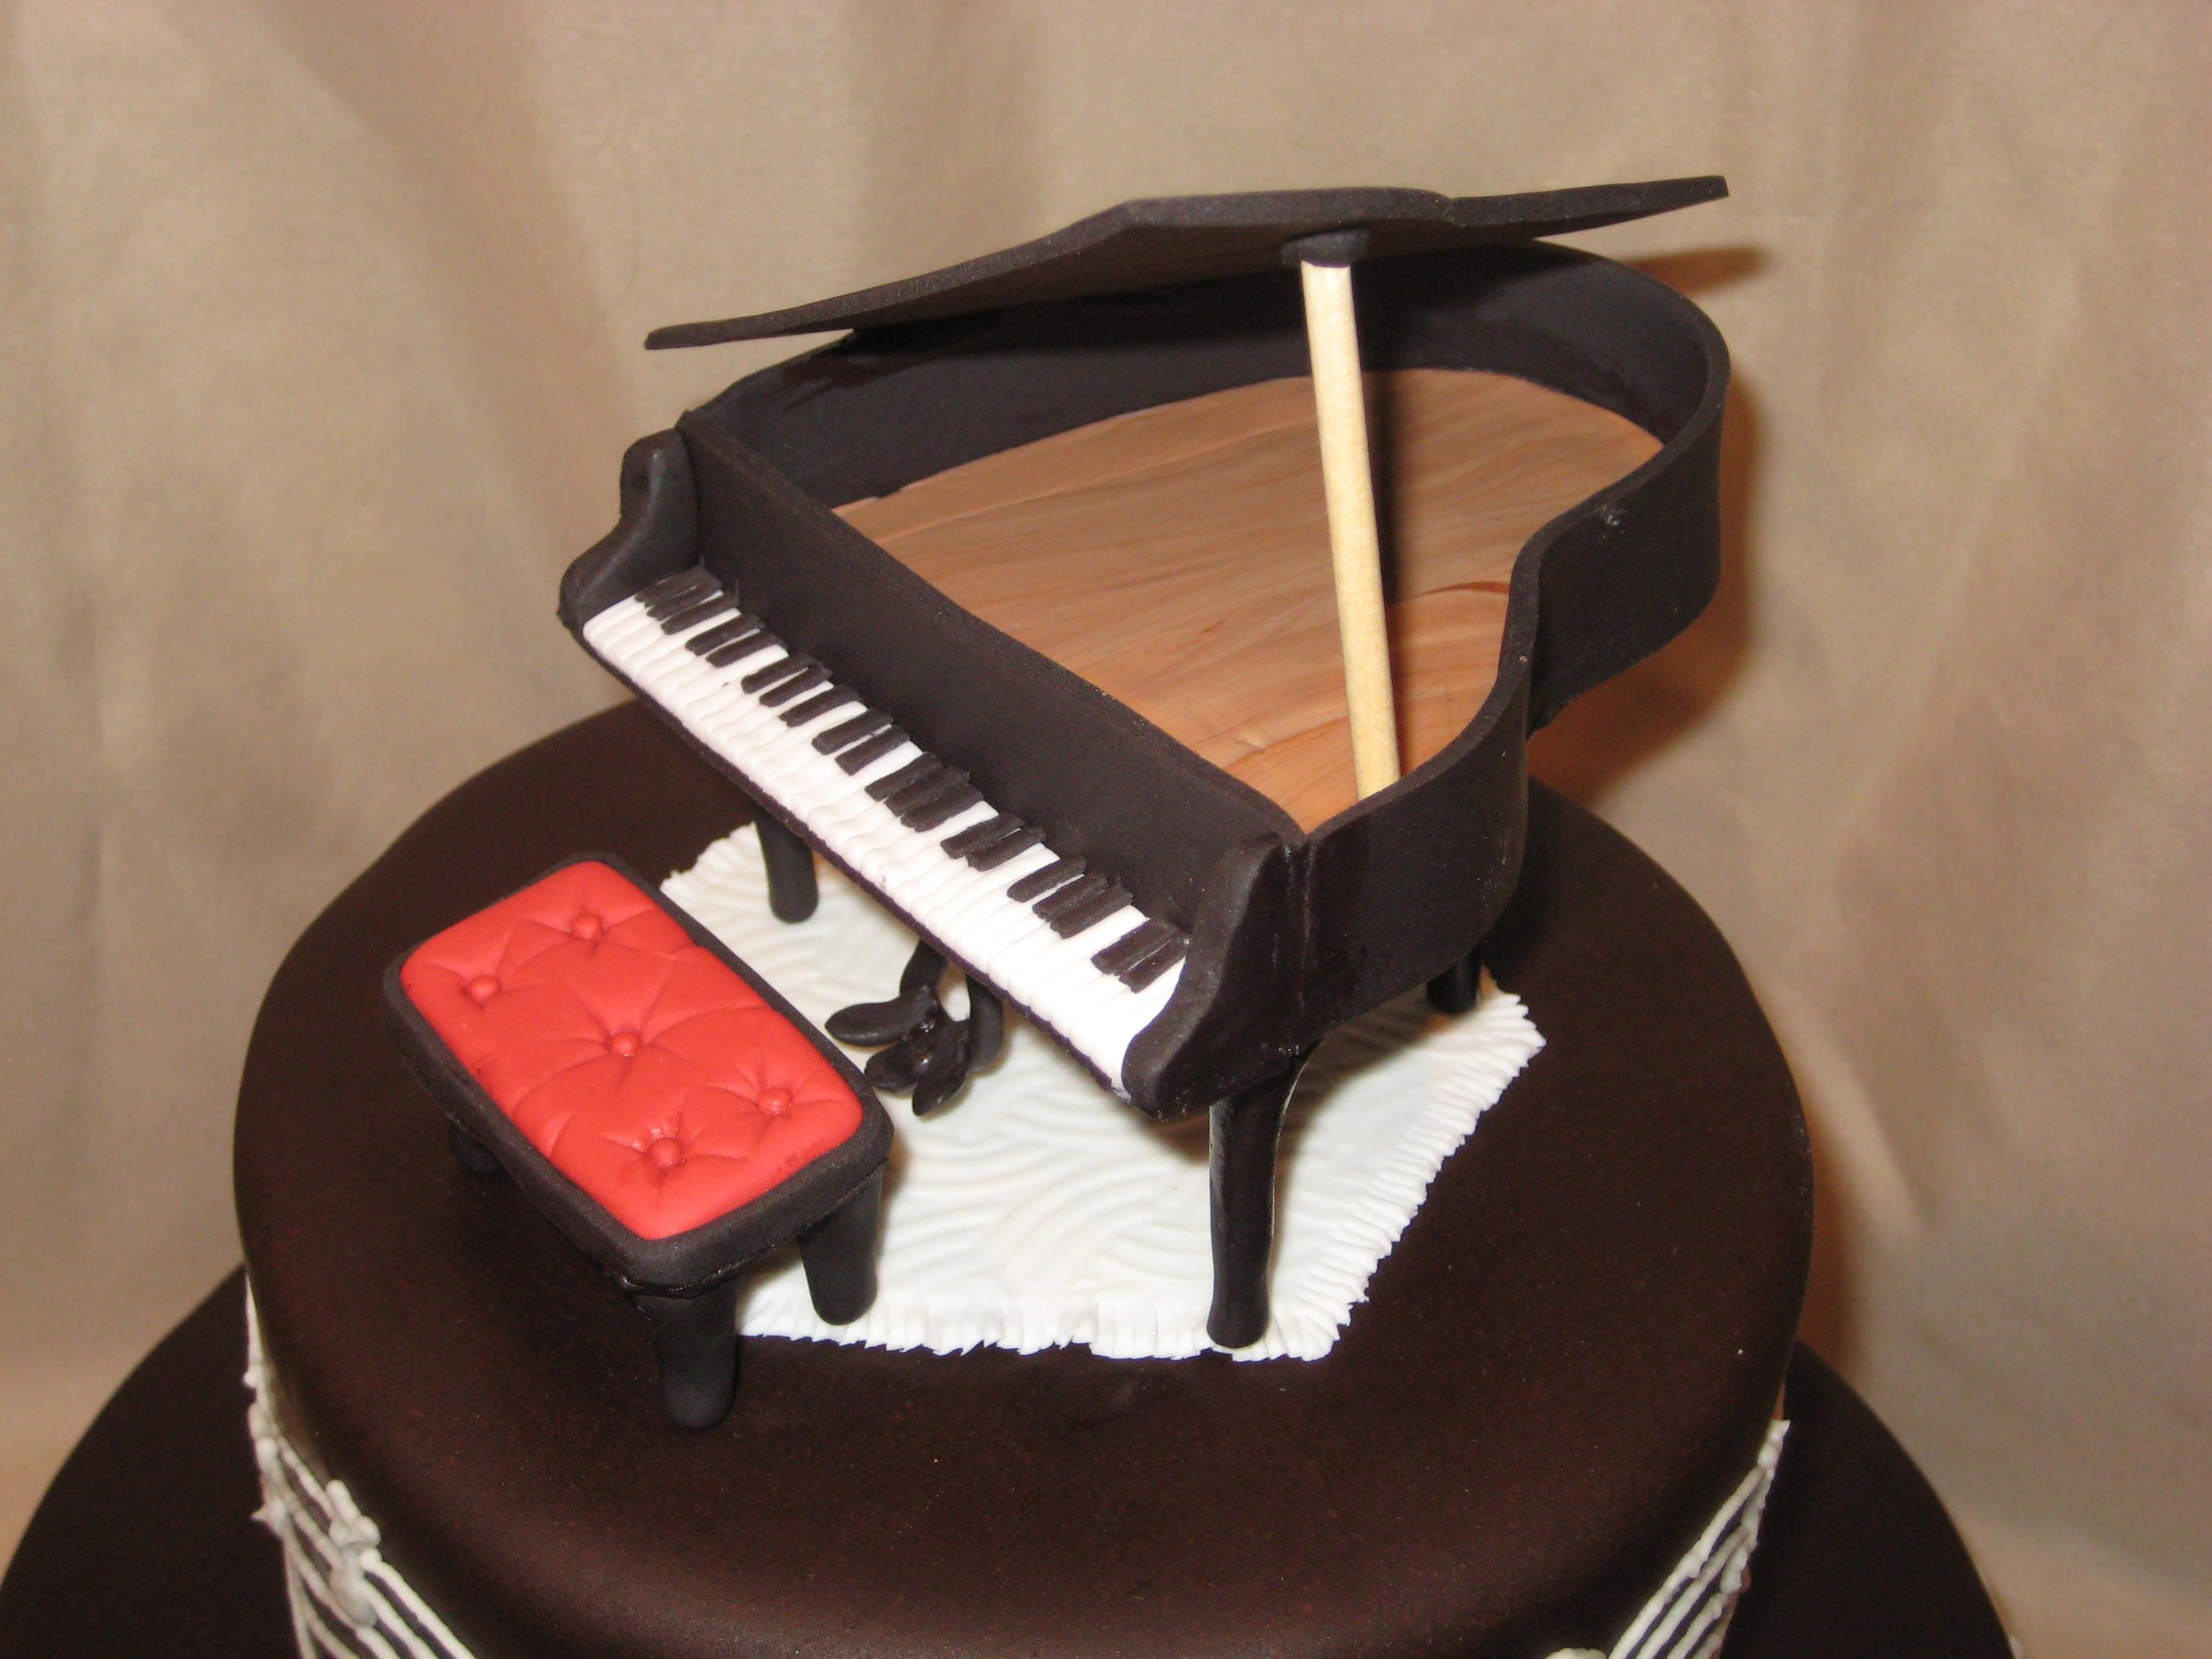 The Piano Cake